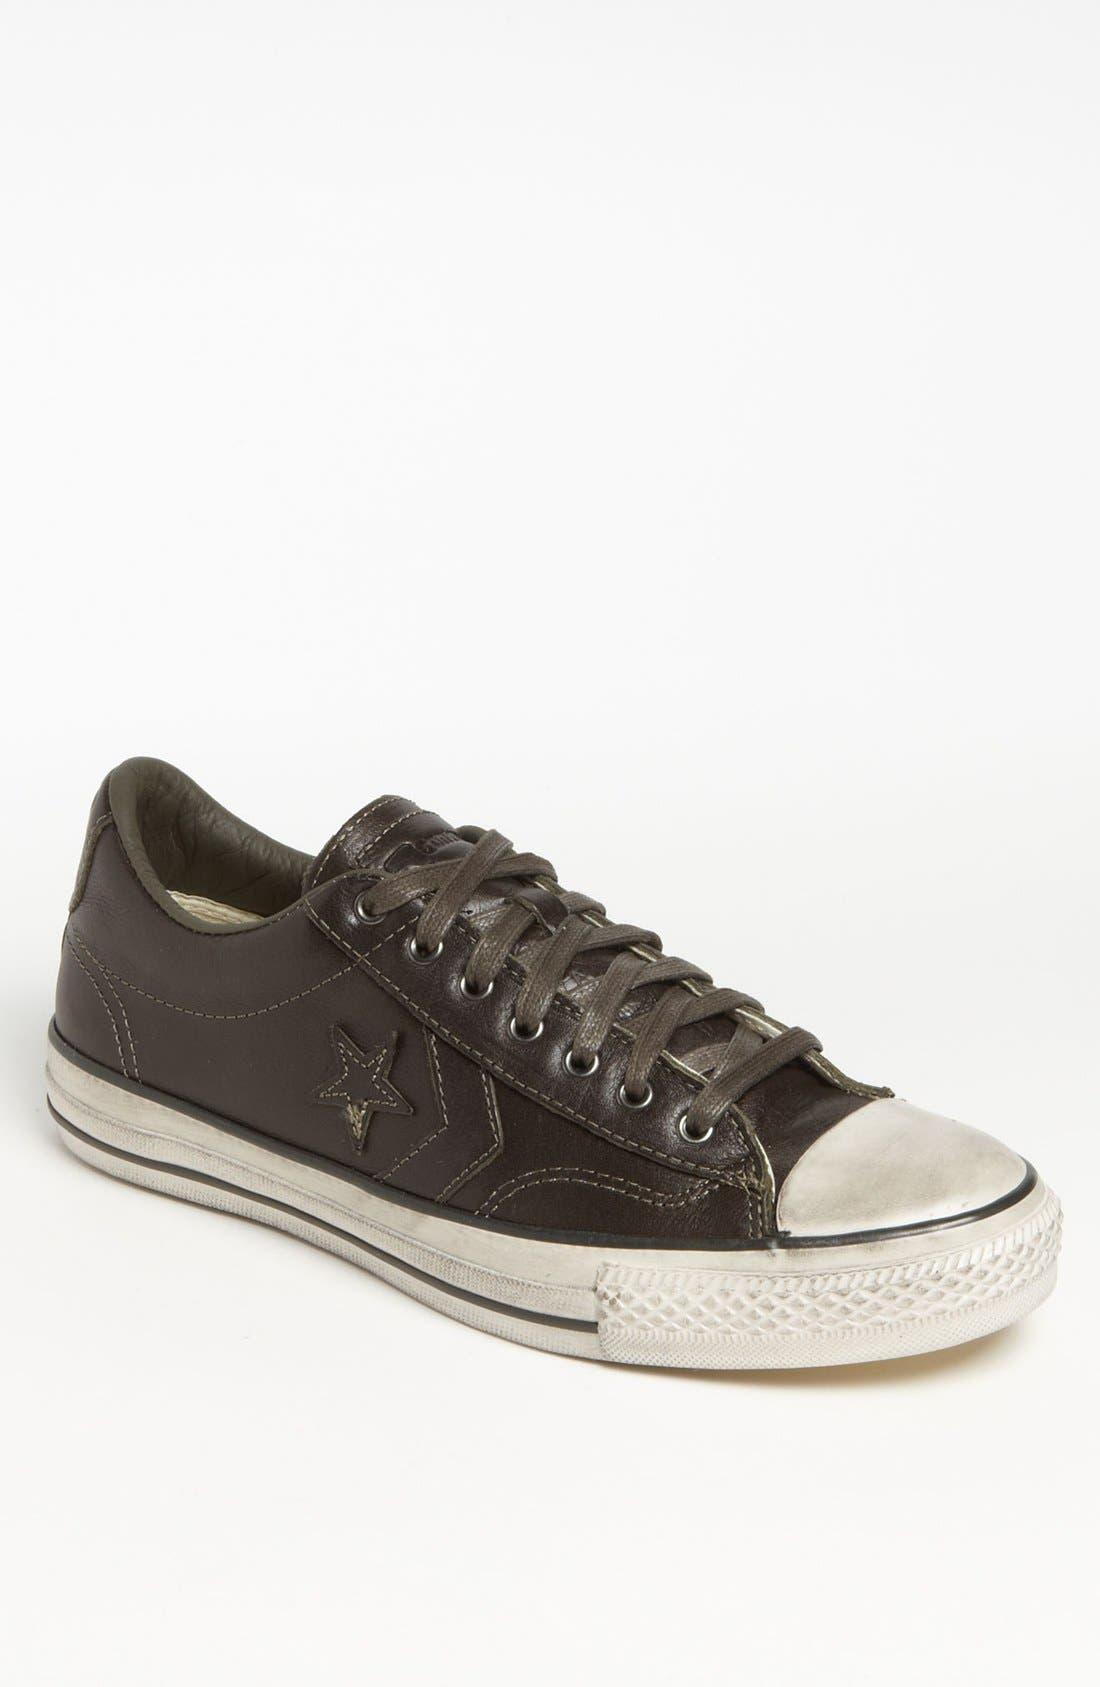 Alternate Image 1 Selected - Converse by John Varvatos 'Star Player' Sneaker (Men)